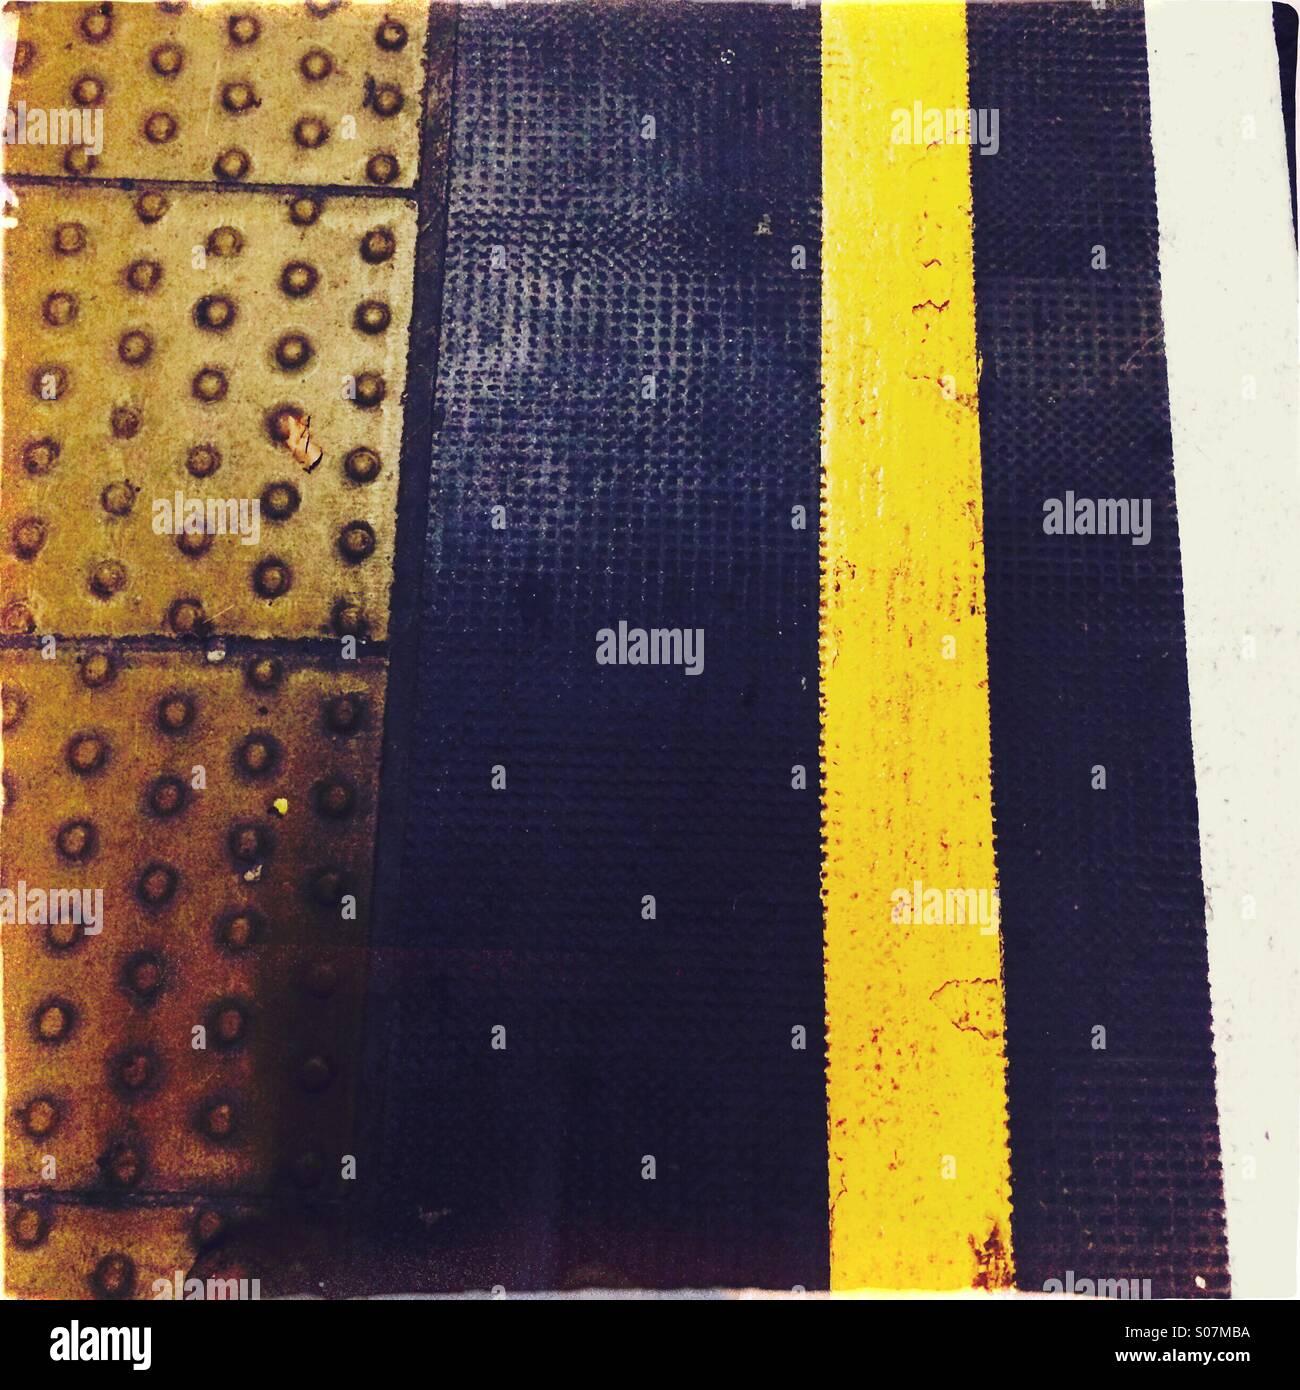 Platform edge line markings - Stock Image